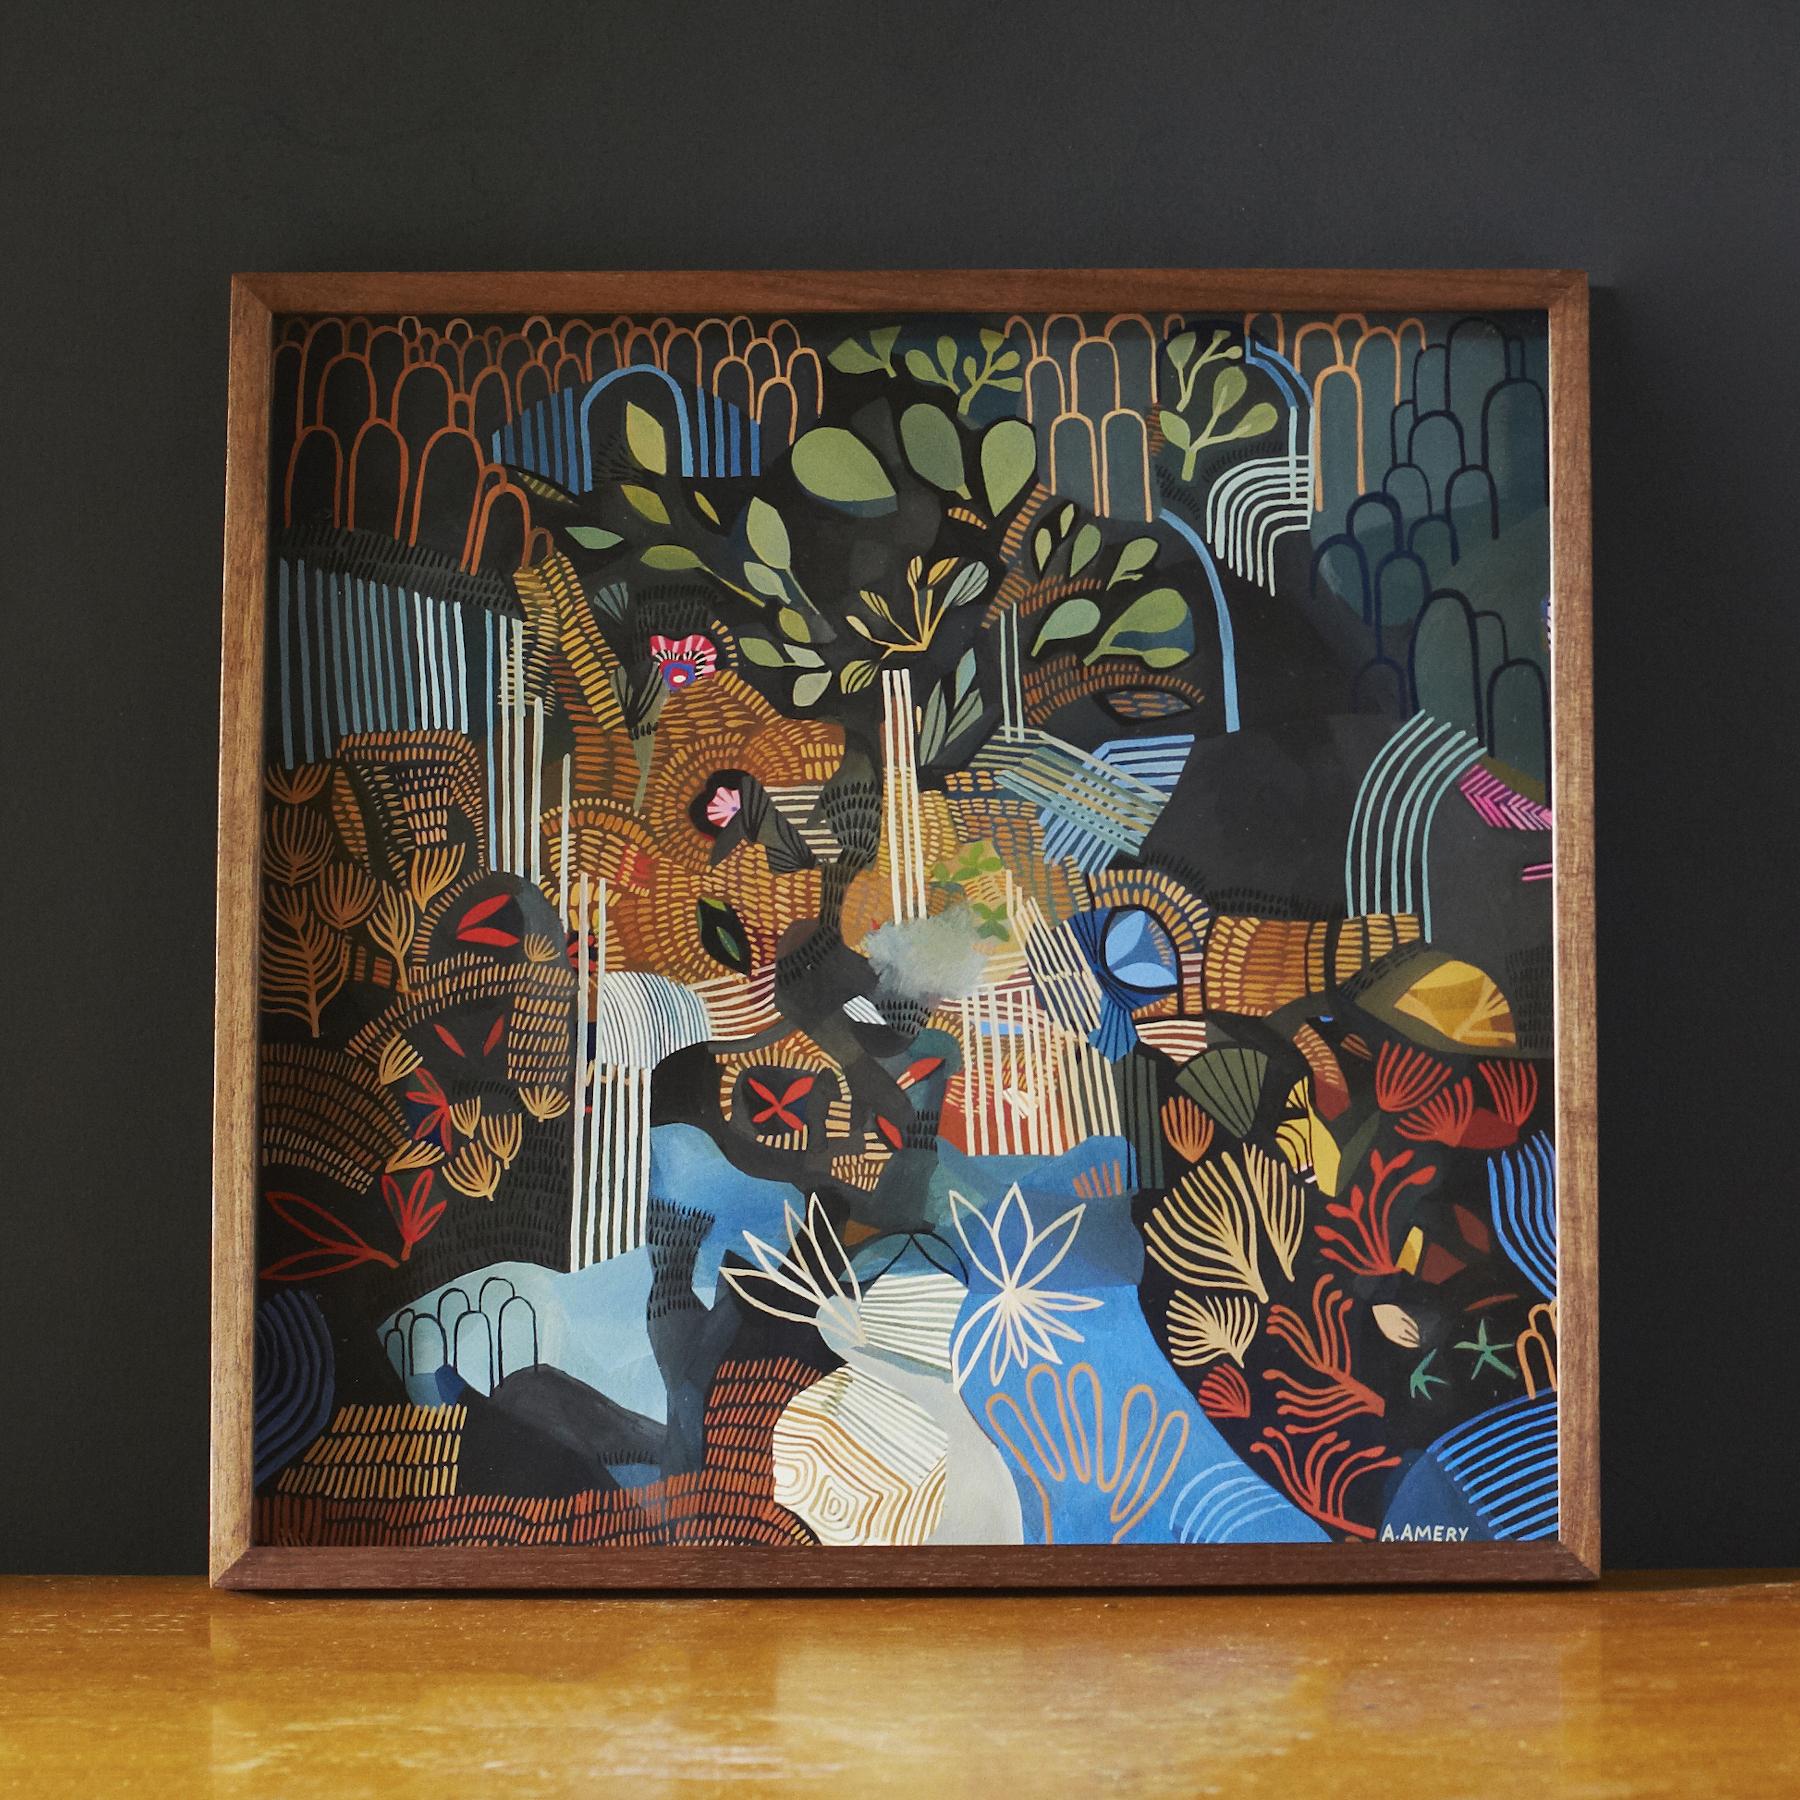 'Night Waterfalls',Ashley Amery,2018,40 x 42 cm,Gouache on paper